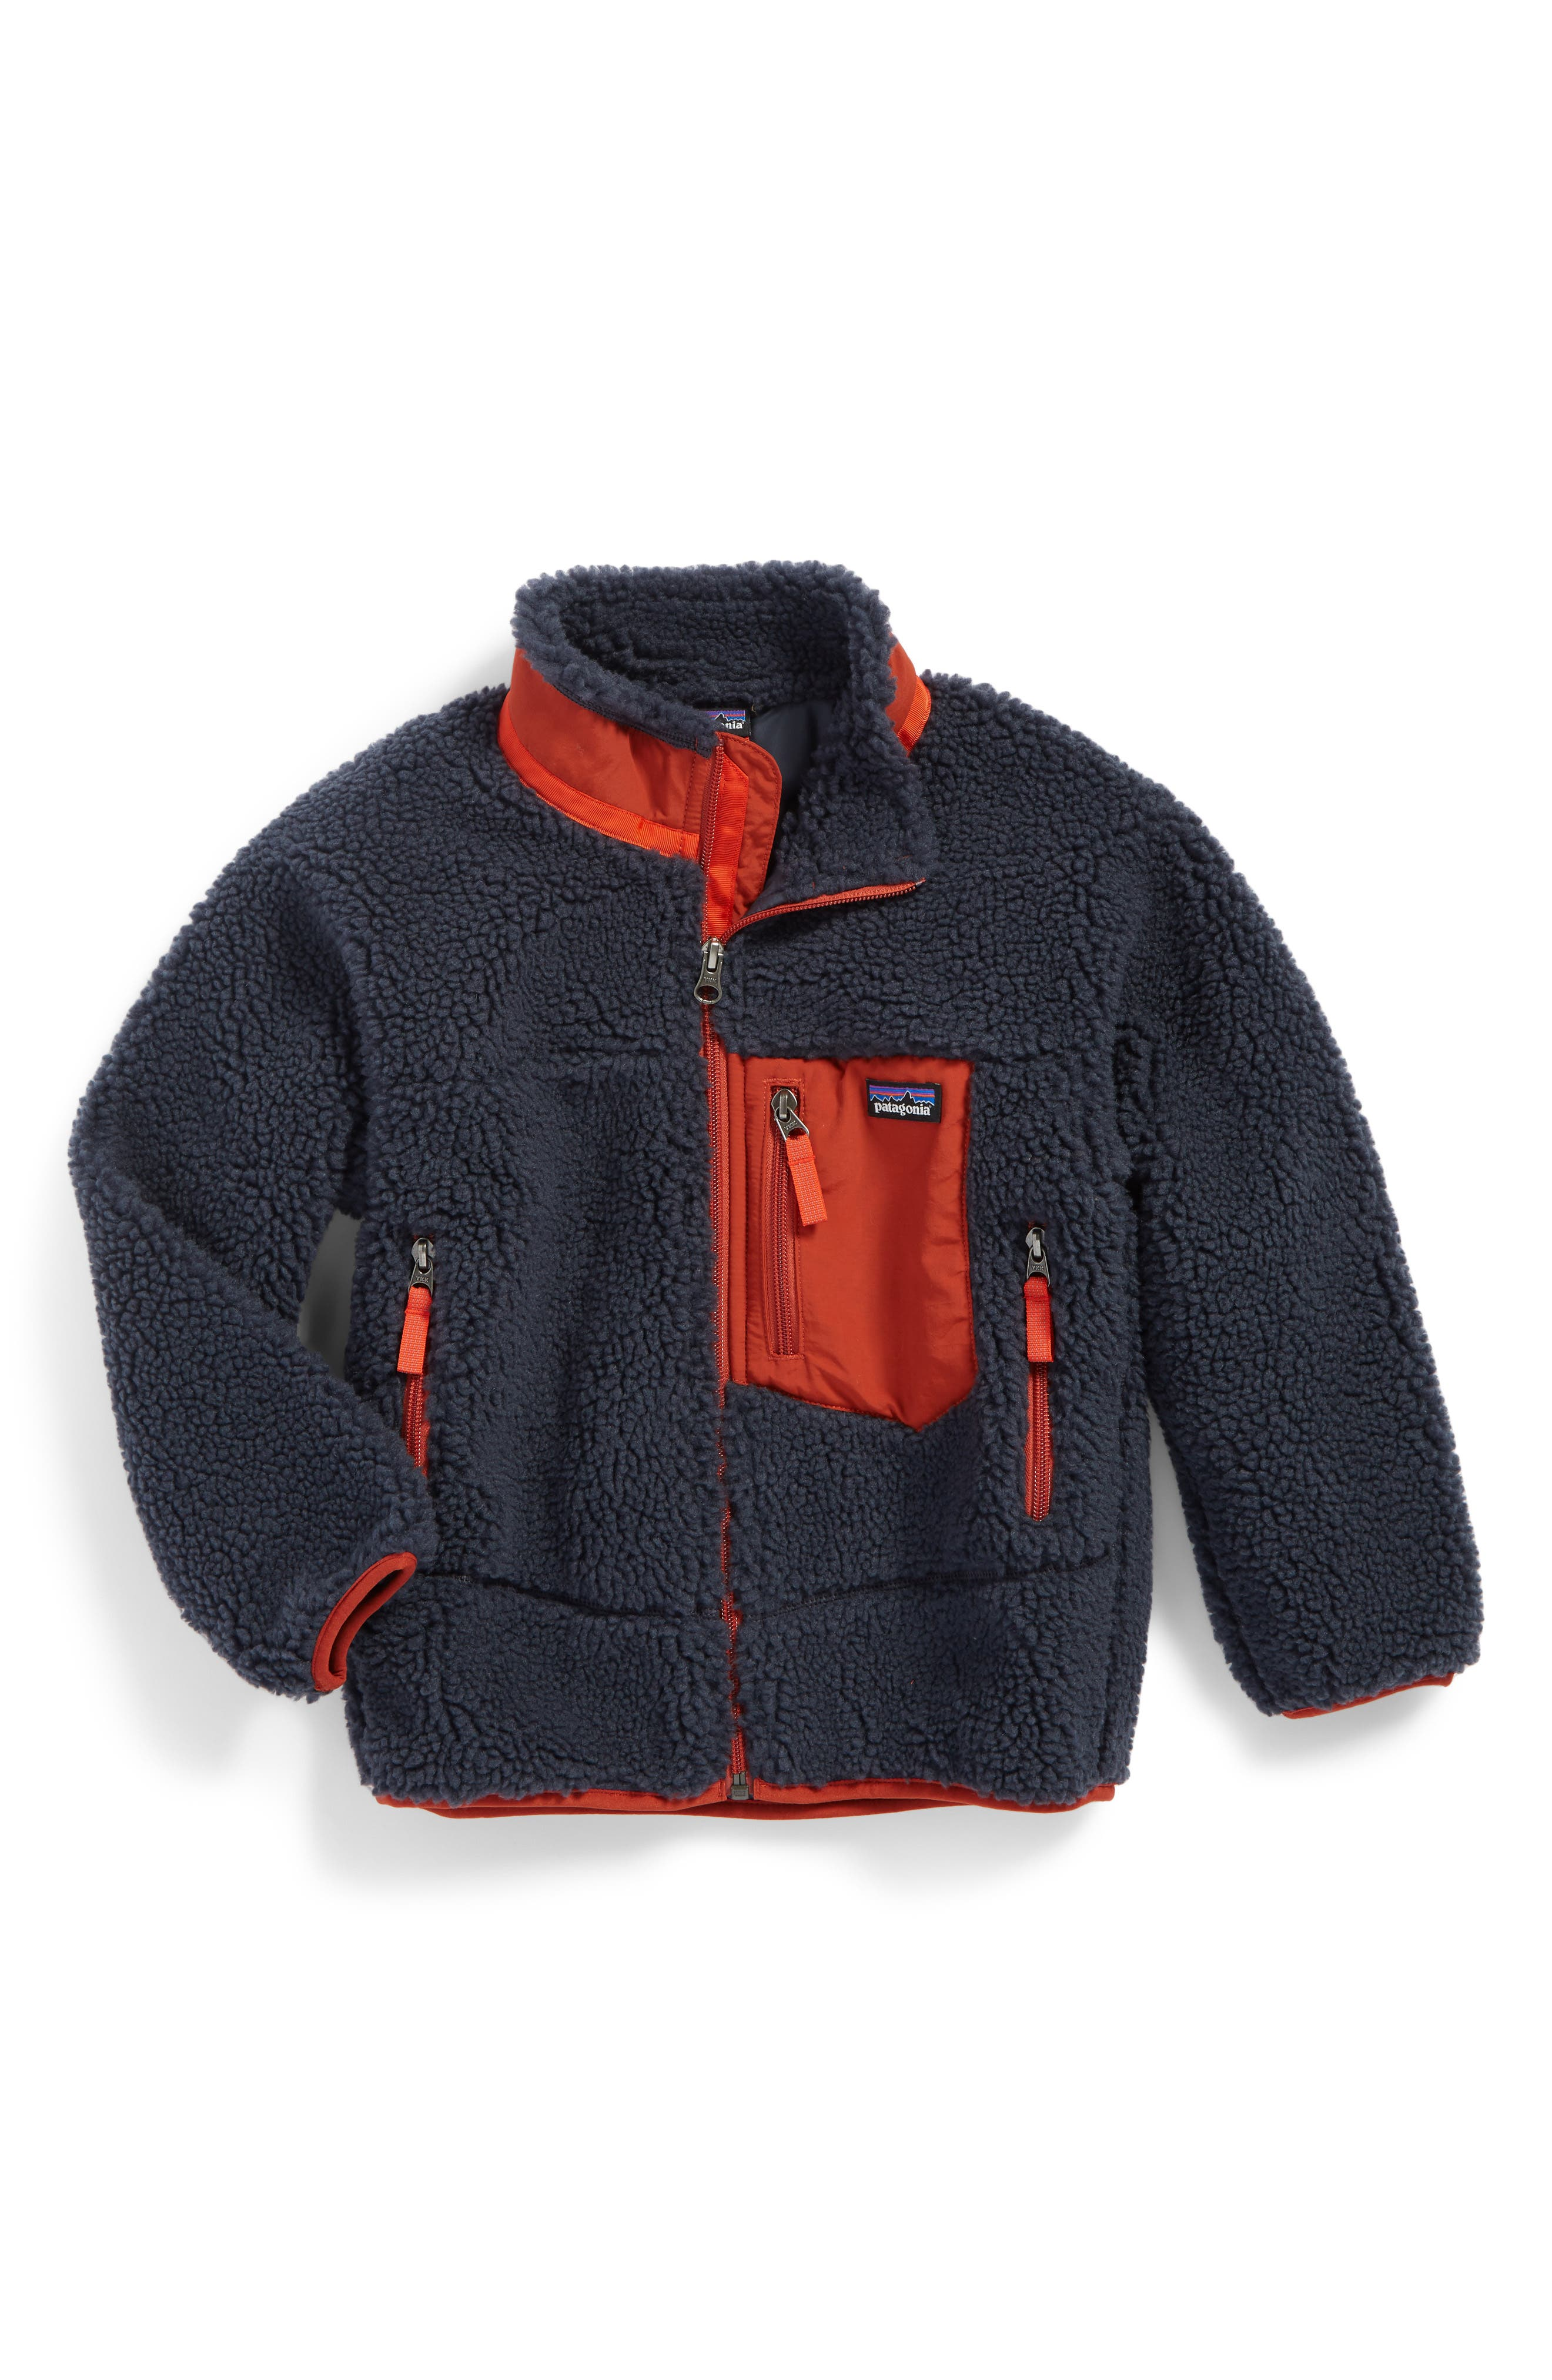 Main Image - Patagonia Retro-X Windproof Fleece Jacket (Big Boys)